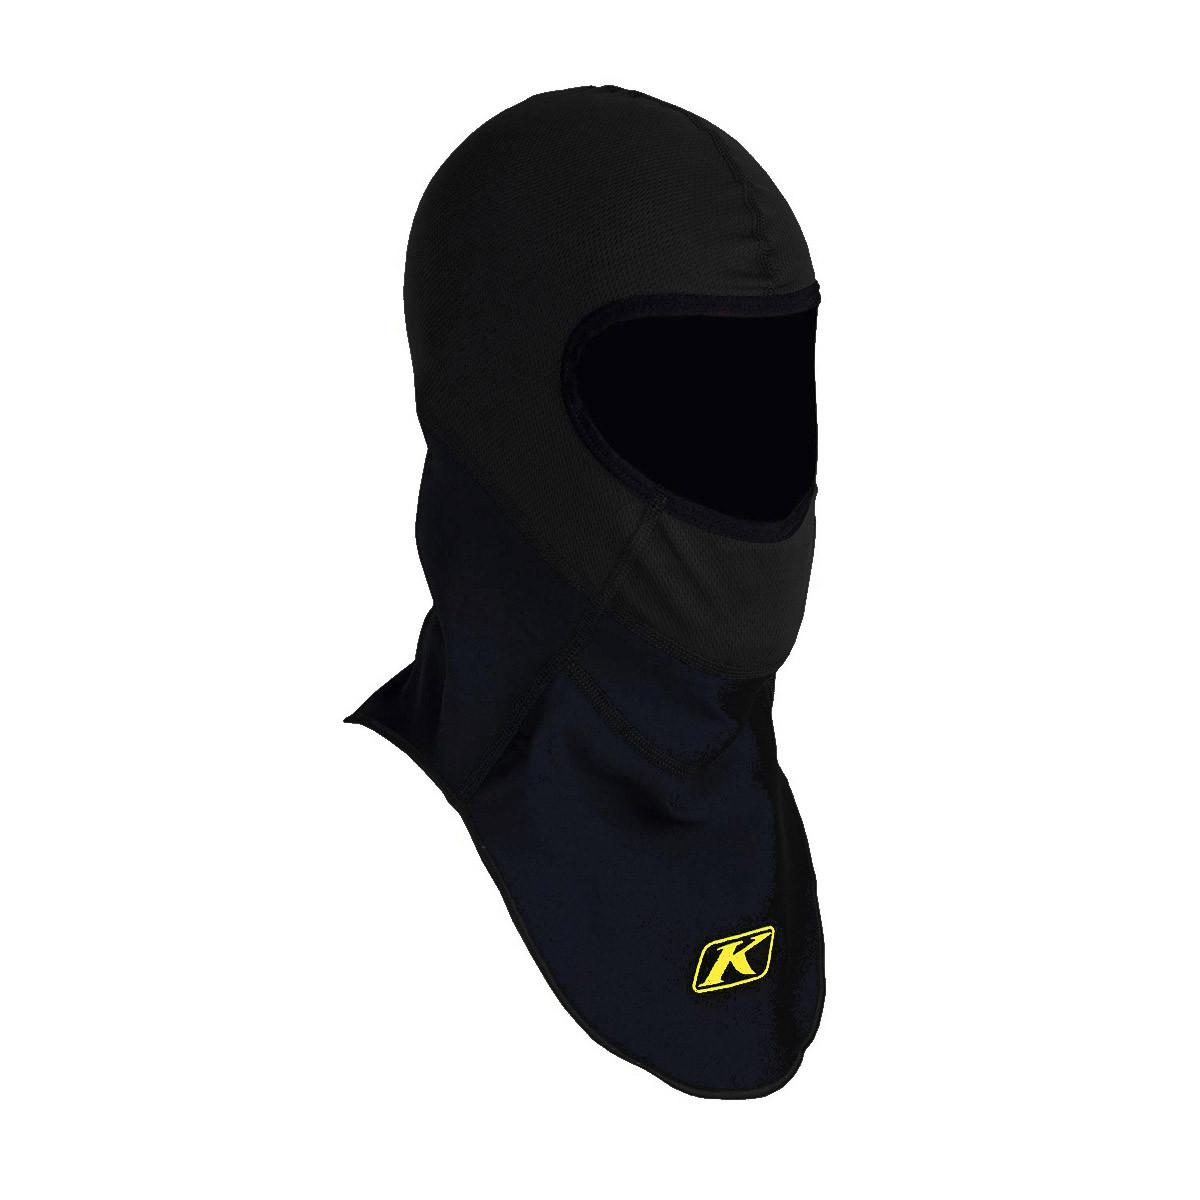 c9a35d46b9fd0 Snow Men's Headwear | KLIM